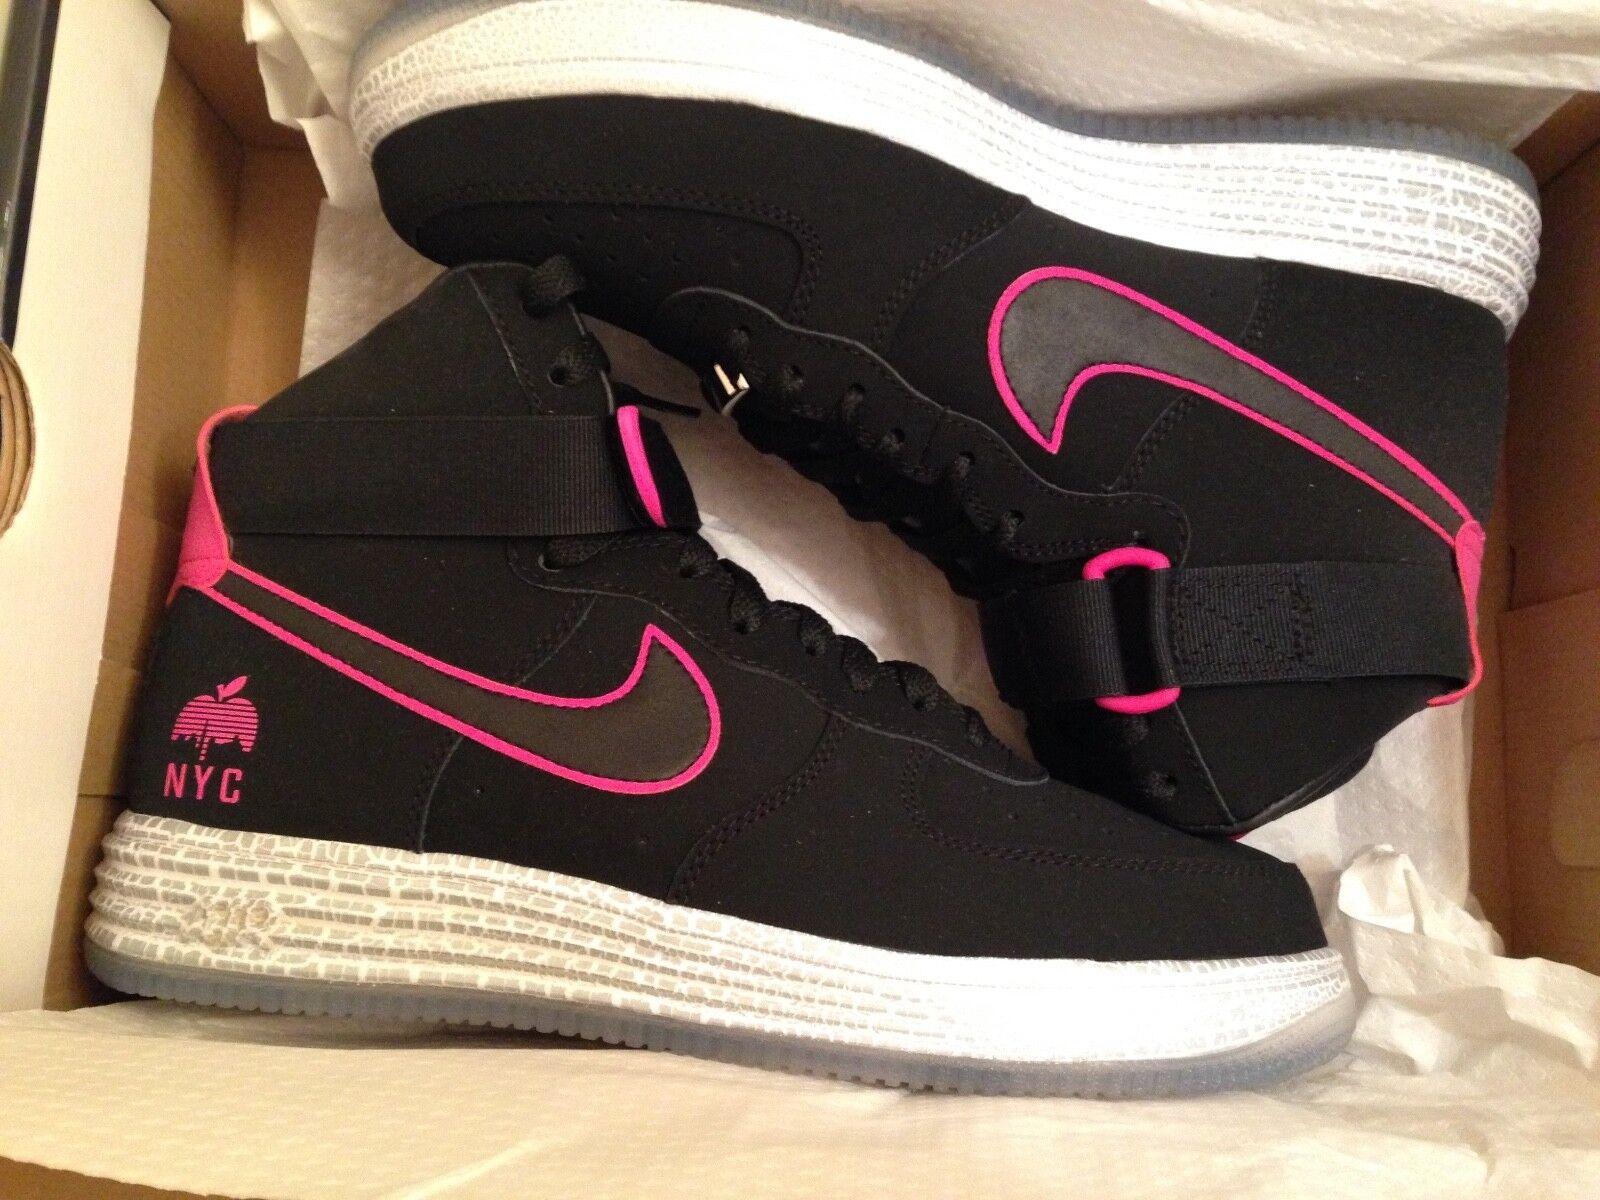 Nike Hi Lunar Force 1 Hyp Hi Nike Qs NYC talla (US 9) Negro/Rosa Aluminio NUEVO 816a6e